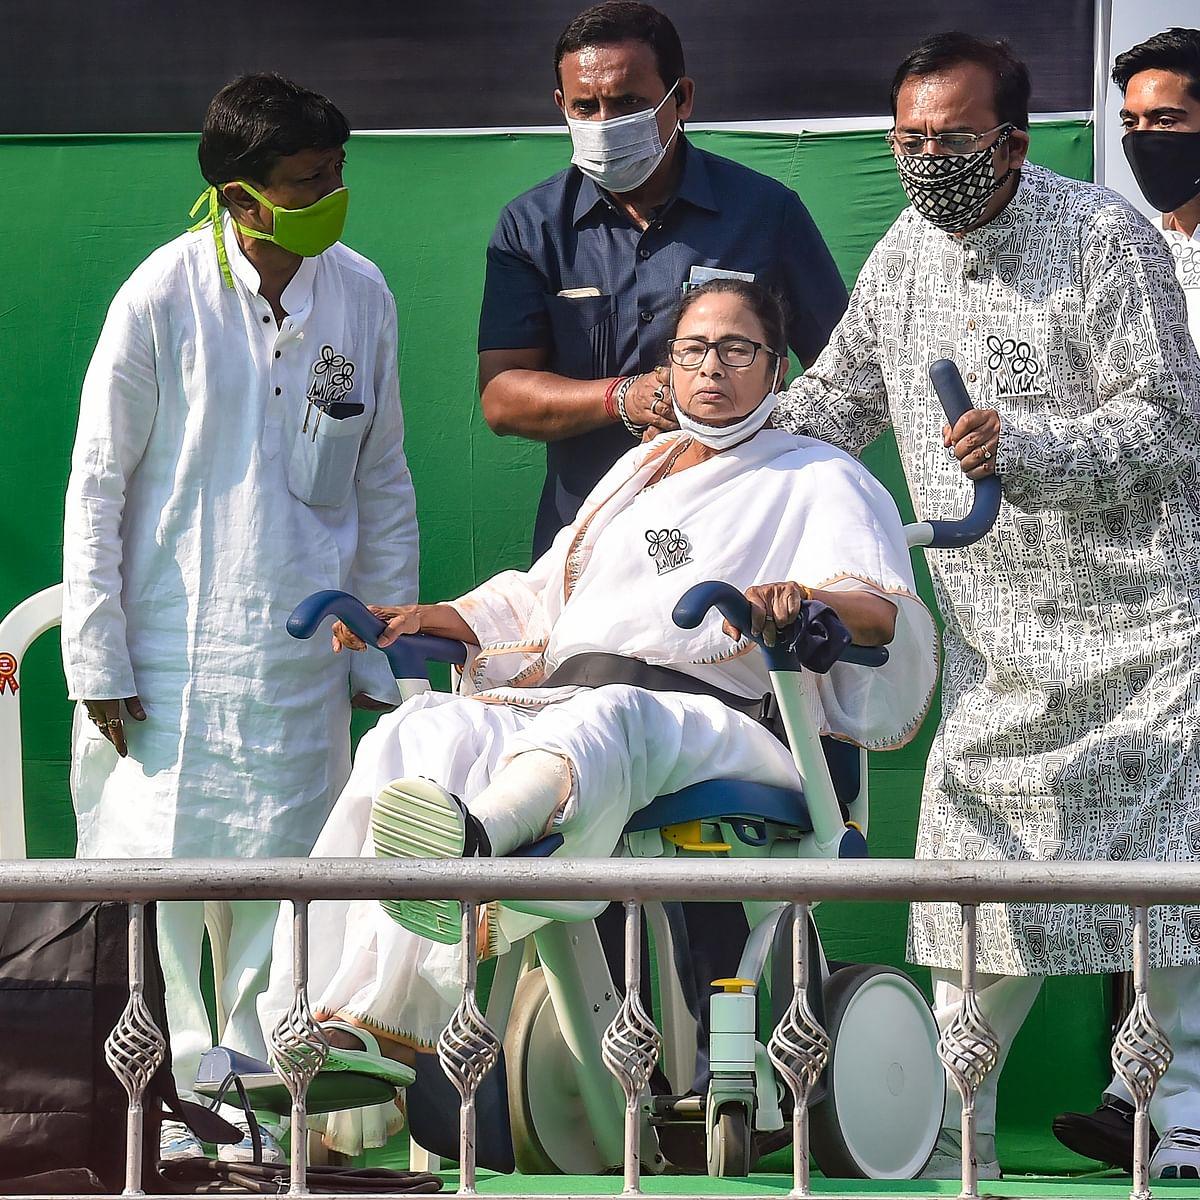 'Khela hobe, dekha hobe, jeeta hobe': Mamata Banerjee has a new rallying cry for poll-bound West Bengal